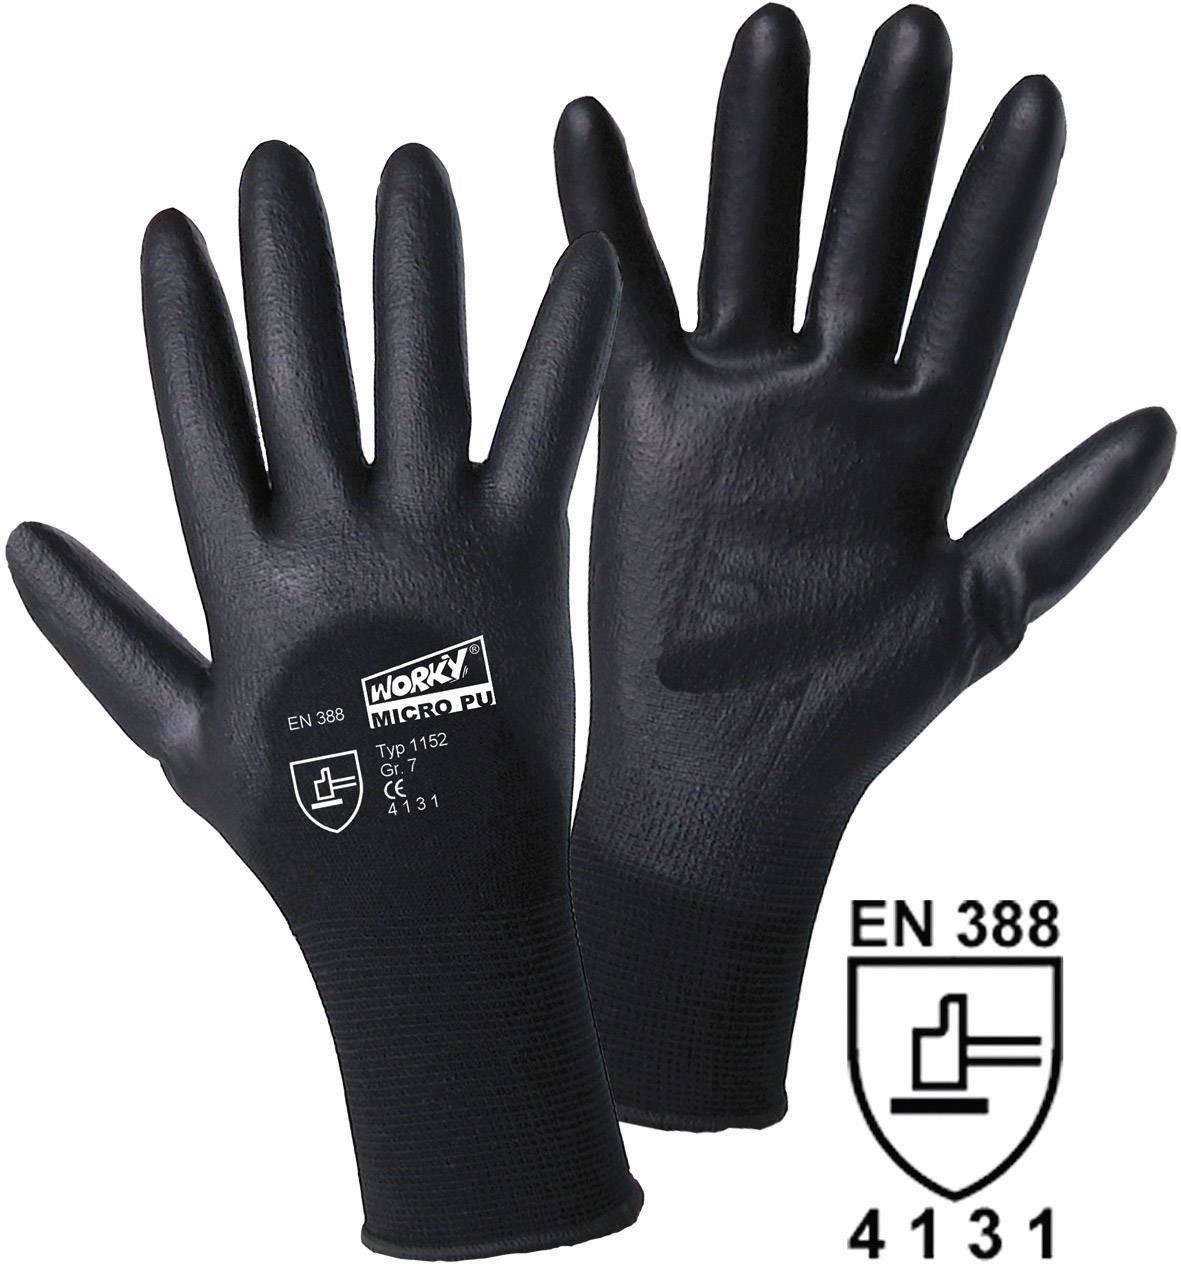 Pracovné rukavice worky MICRO black2 1152, velikost rukavic: 11, XXL